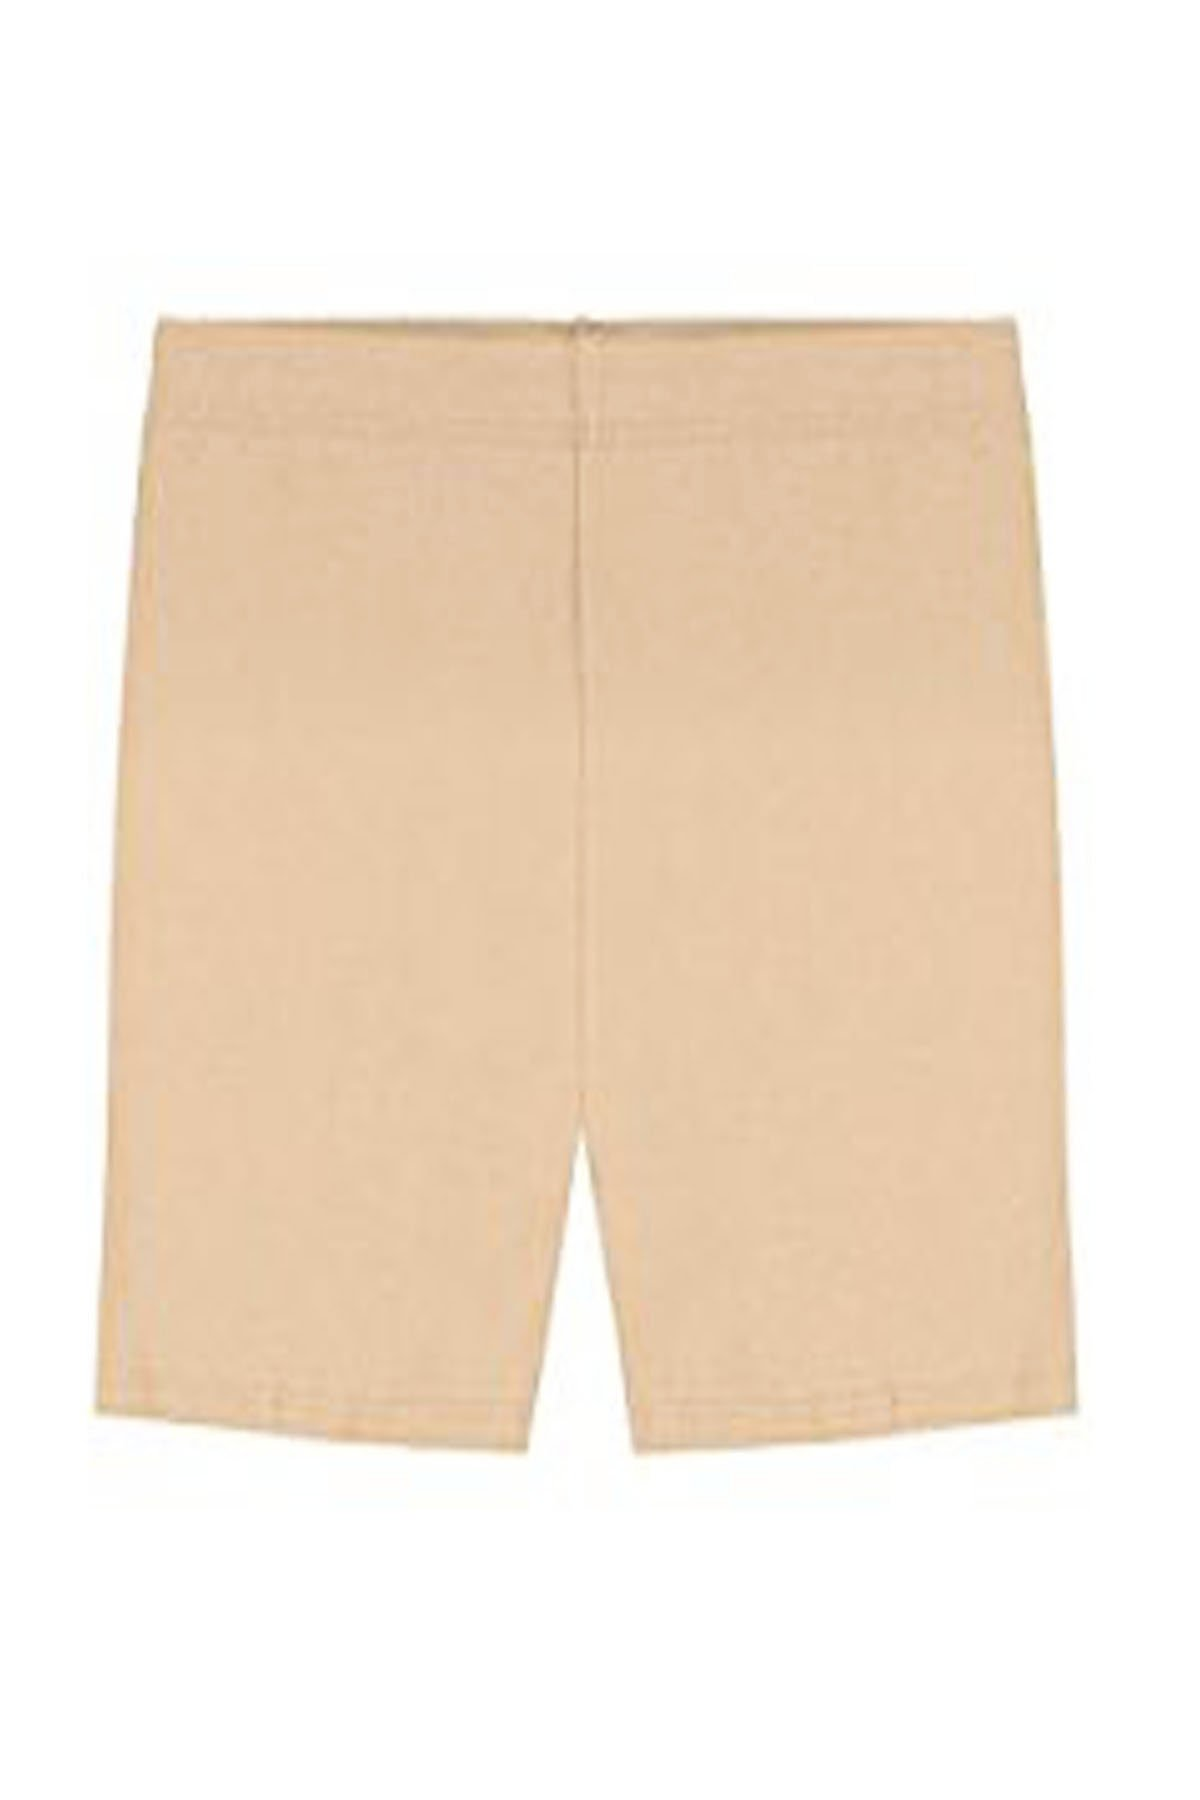 Elegance Girls' Basic Solid Soft Cotton Bike Short for Dance Gymnastics or Under Skirts (11-13 Years, Tan)